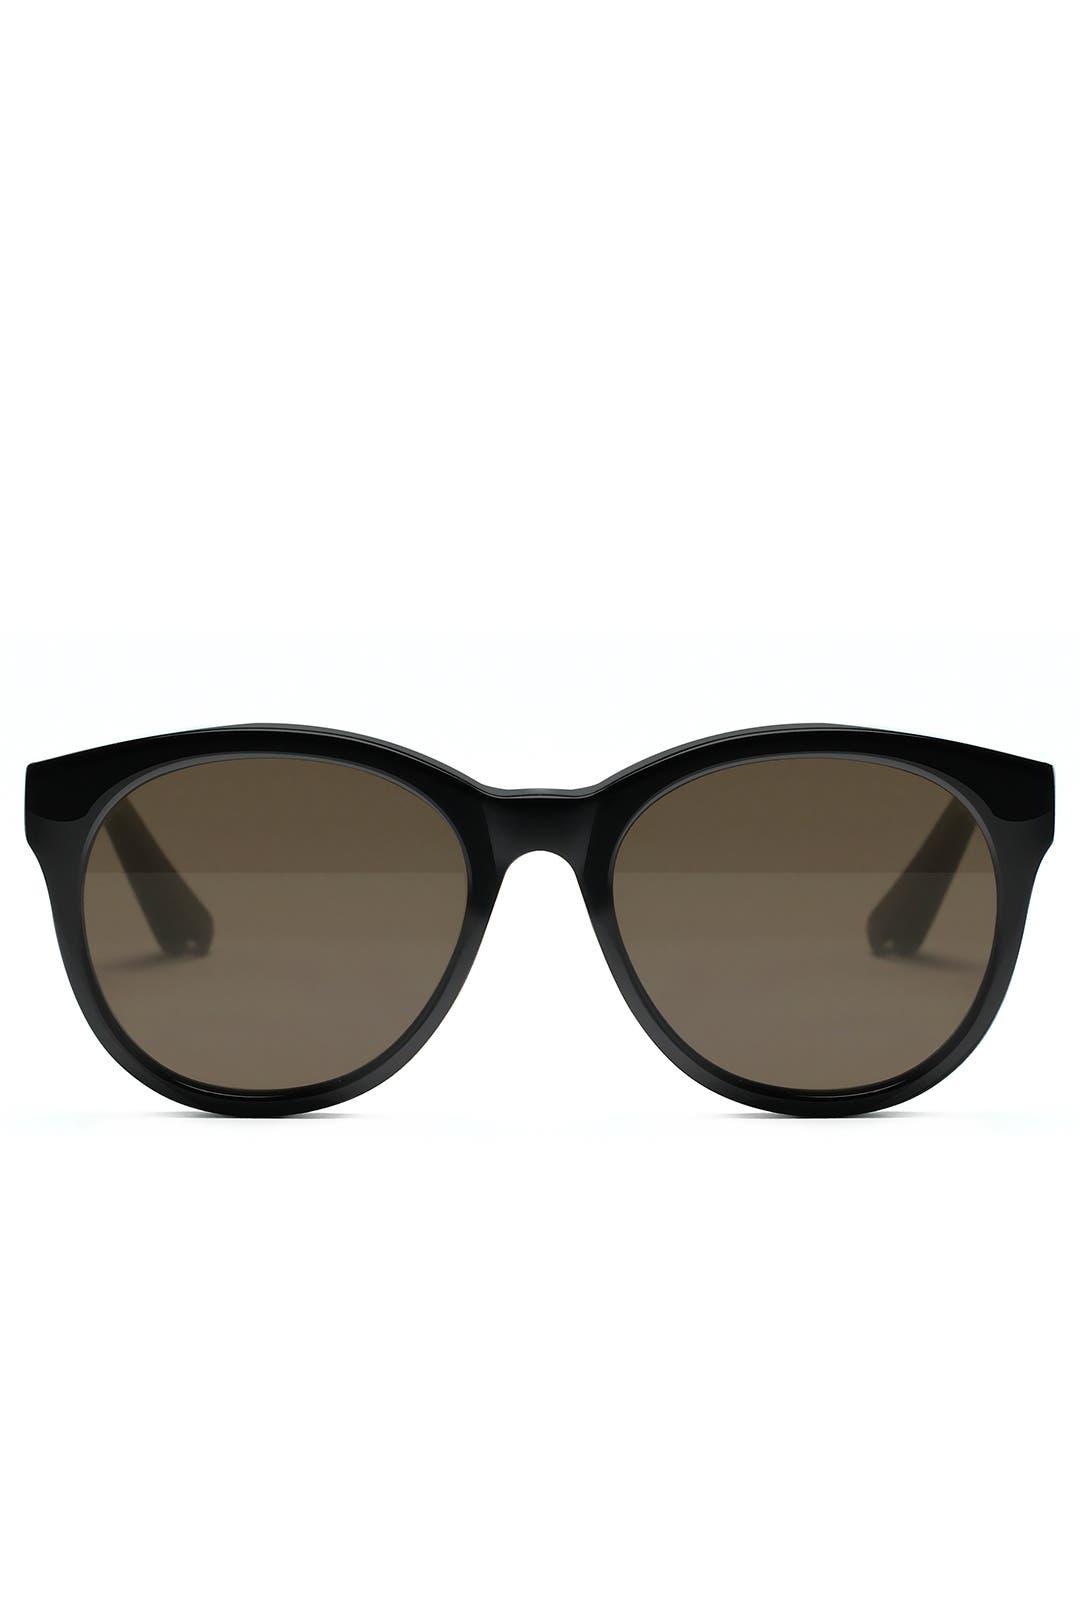 Brook sunglasses - Green Joseph